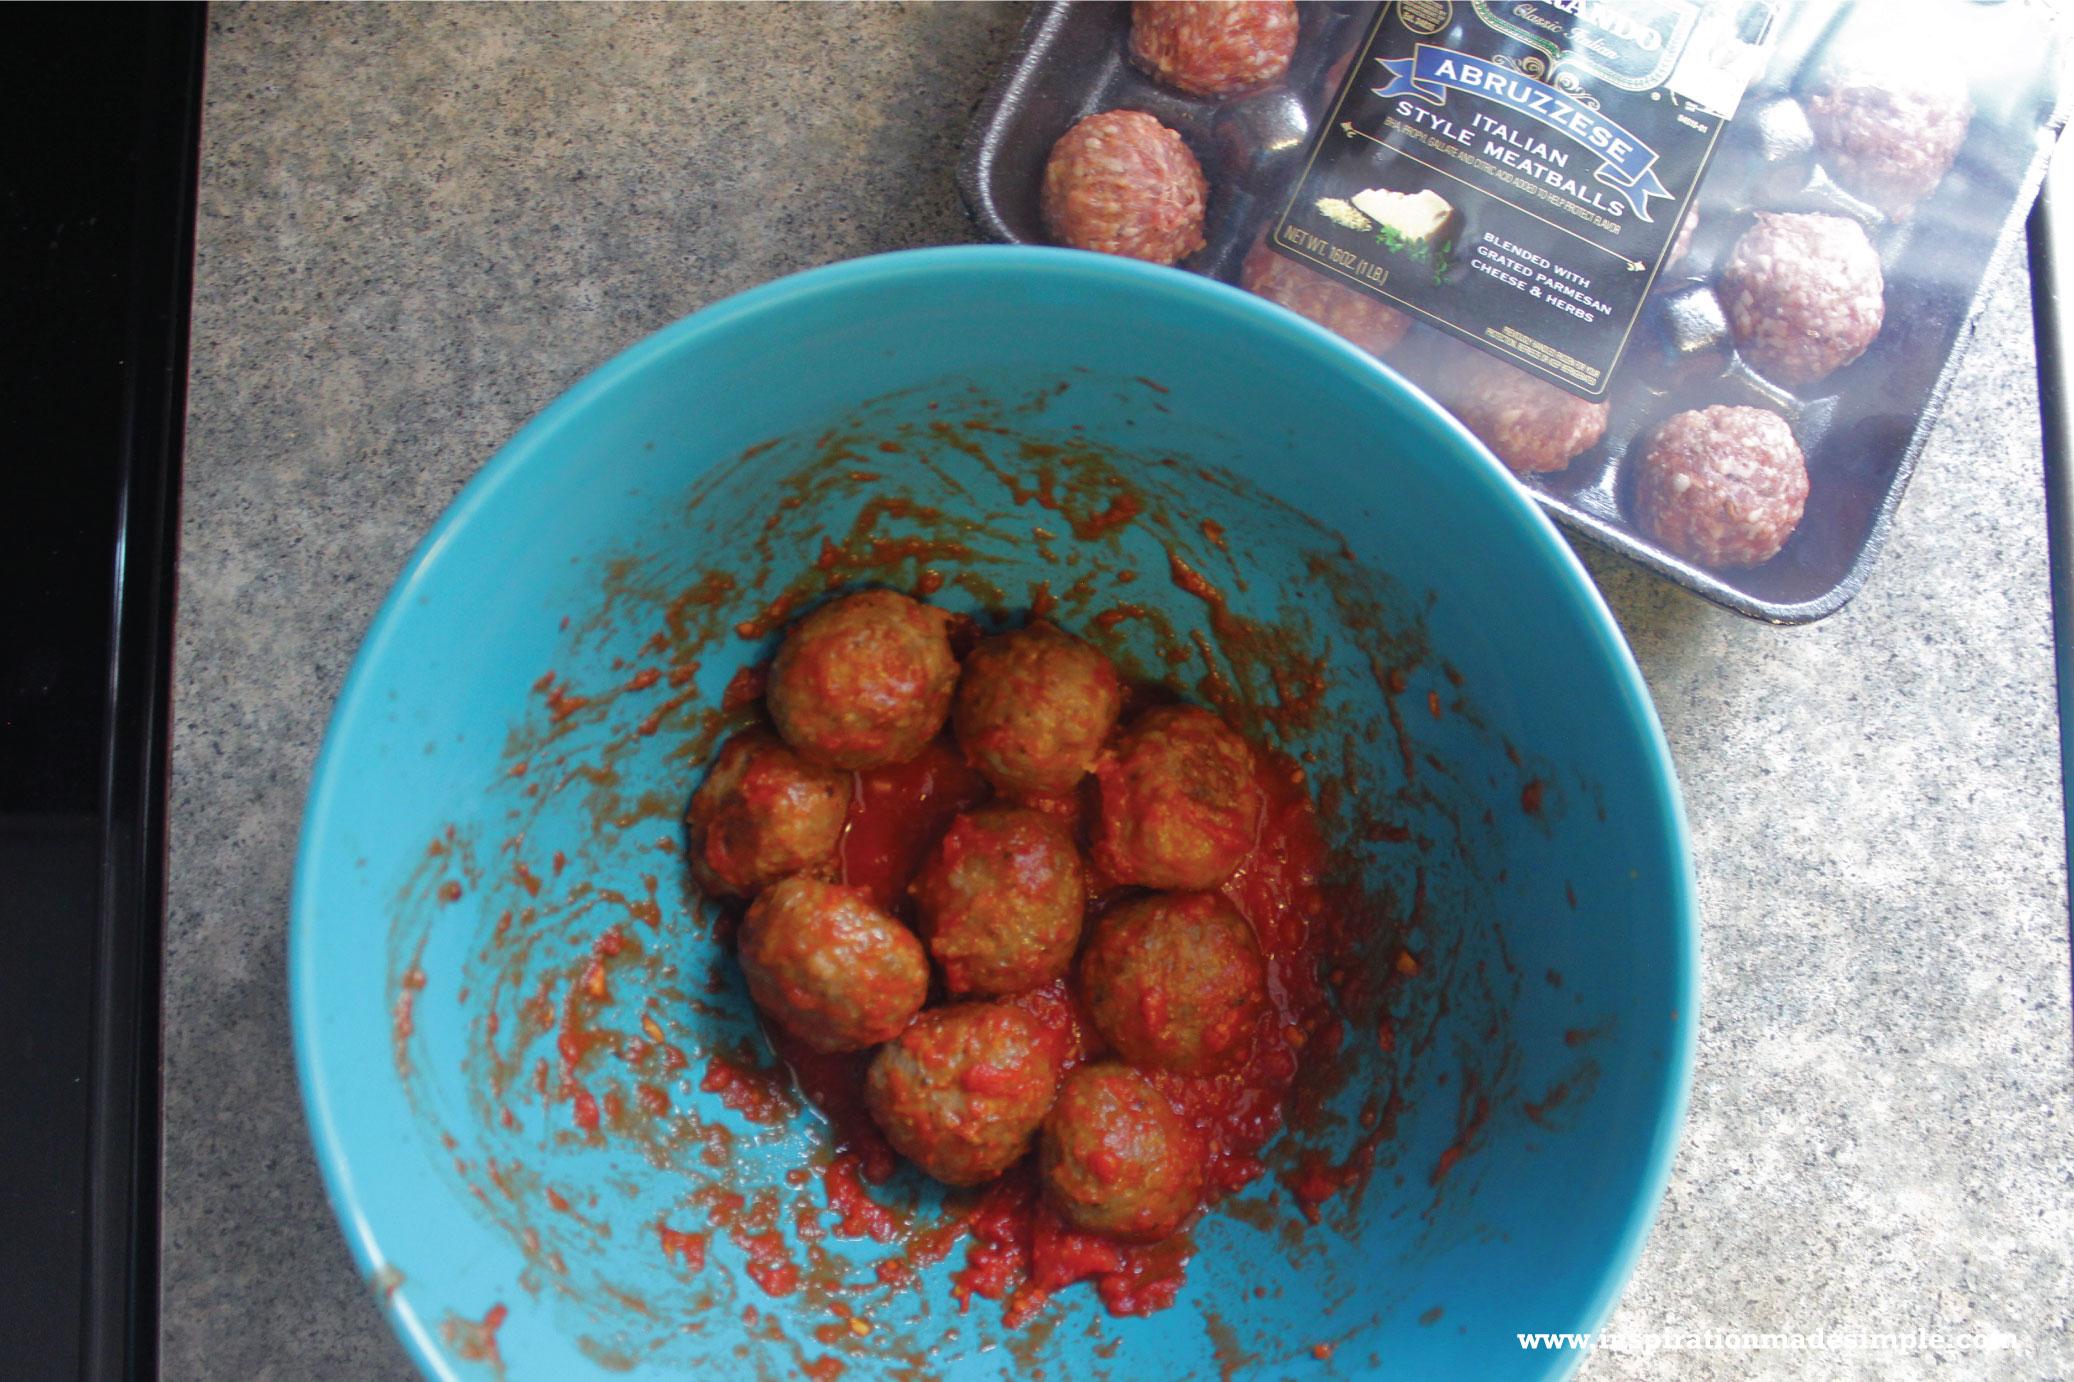 Parmesan Crusted Meatball Quesadillas with Carando Meatballs #MyCarandoMeal